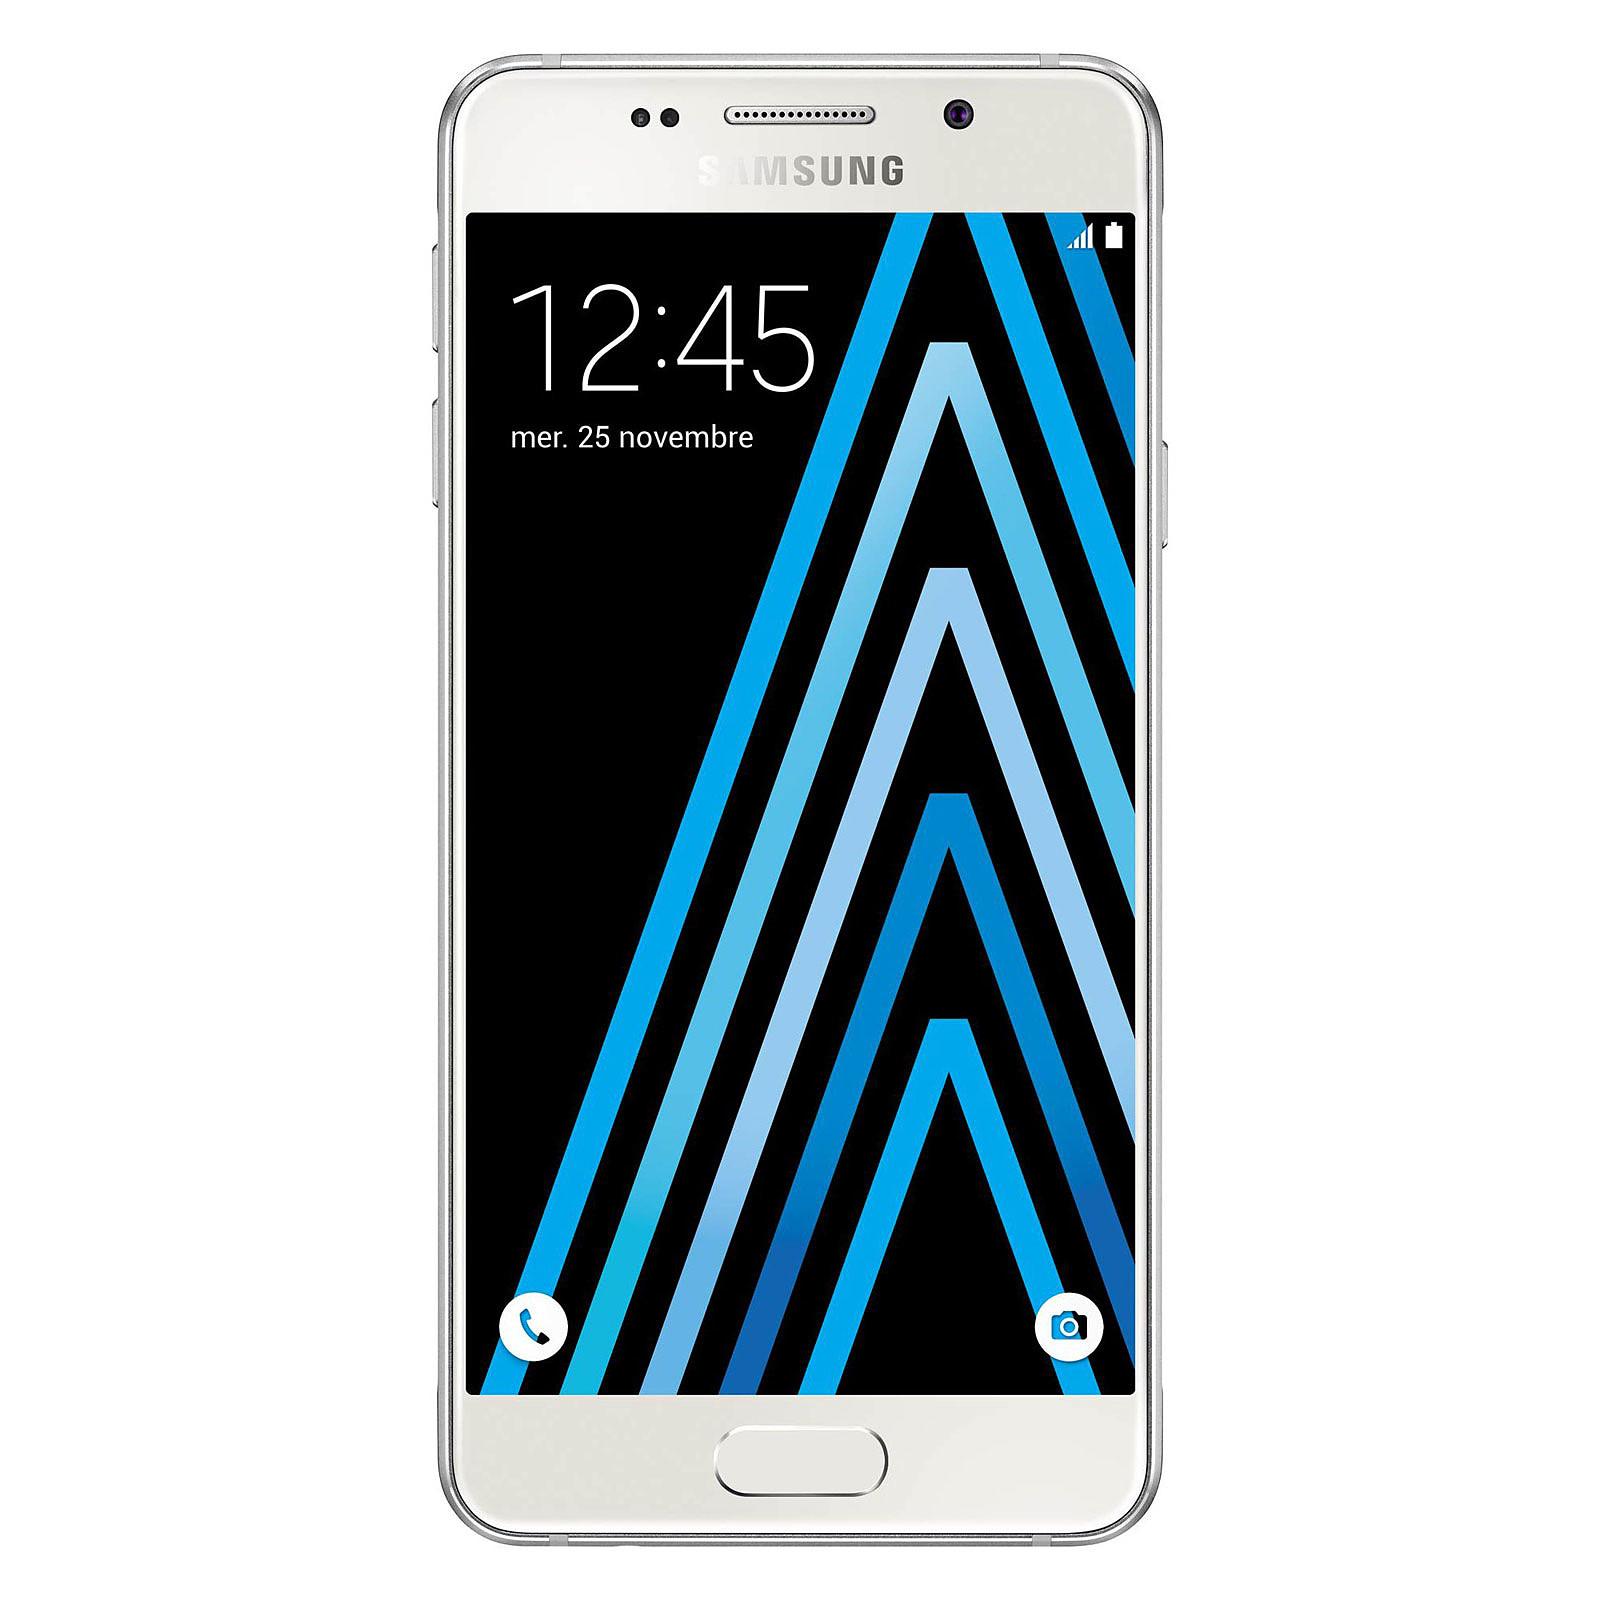 A3 Blanc Sur Galaxy Lk13tjcf Smartphone Samsung 2016 Mobileamp; dxCBore